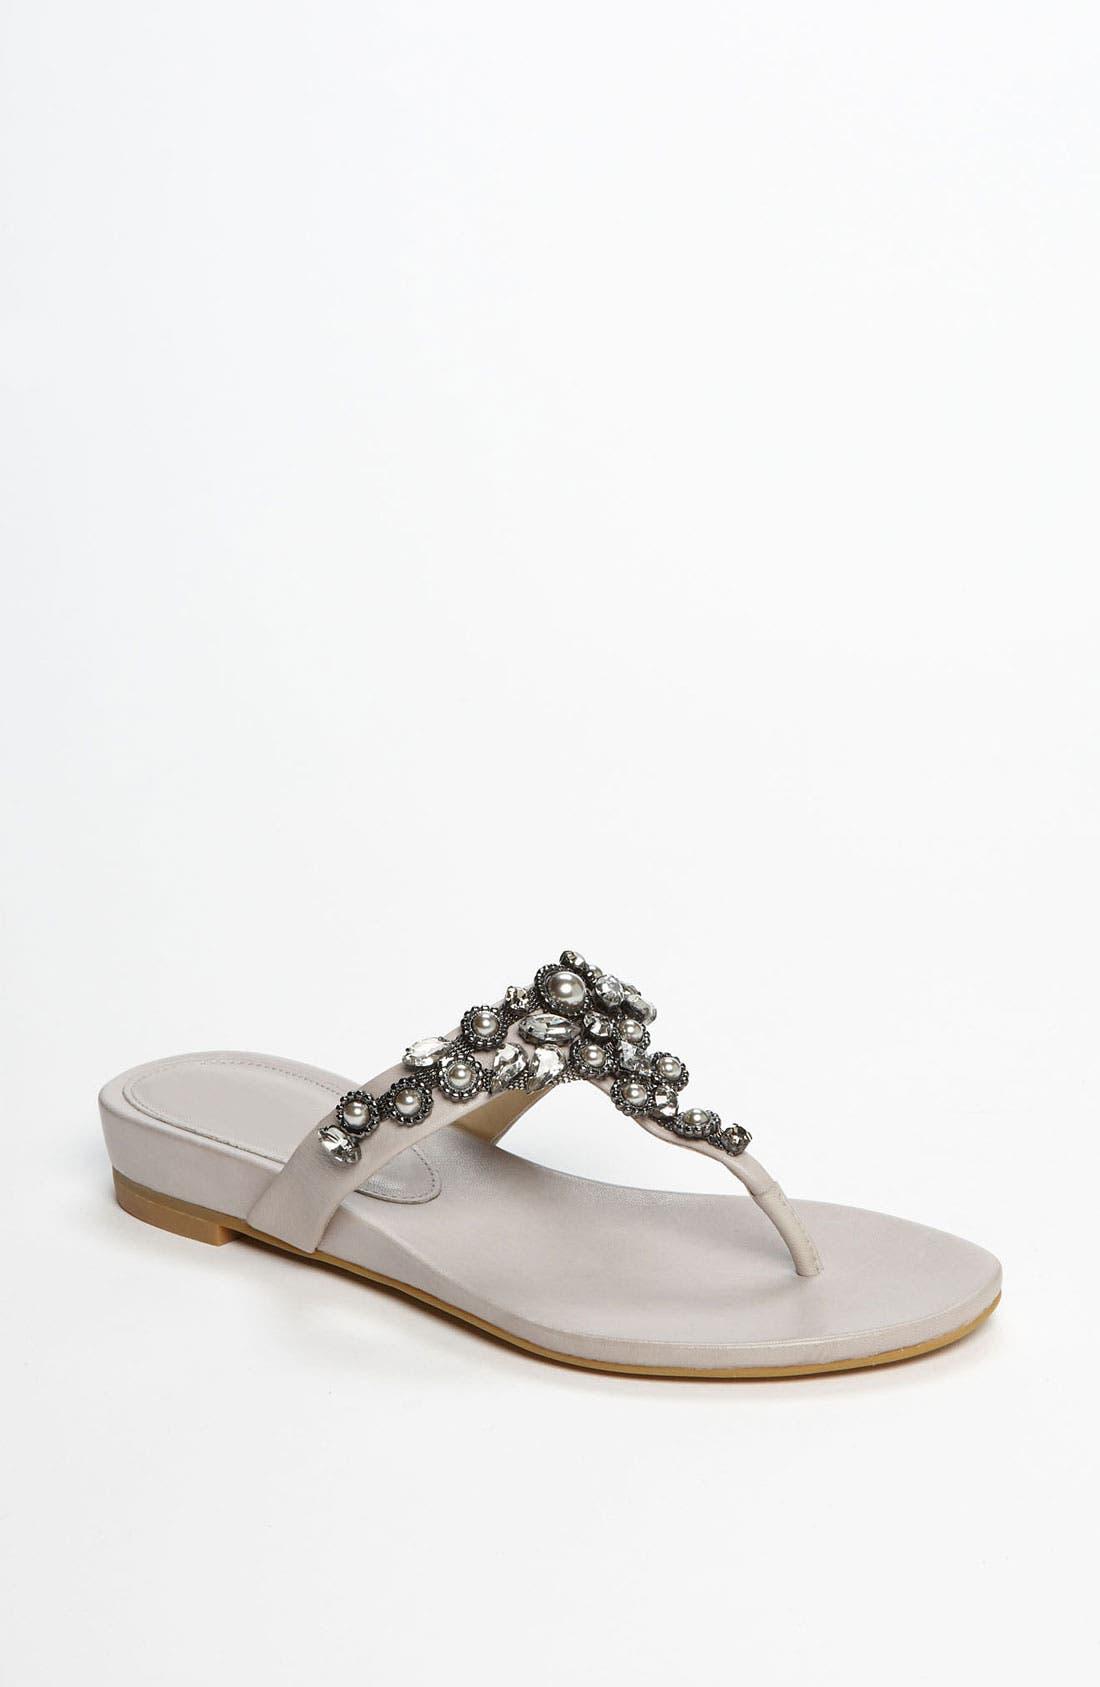 Alternate Image 1 Selected - Vera Wang Footwear 'Benji' Sandal